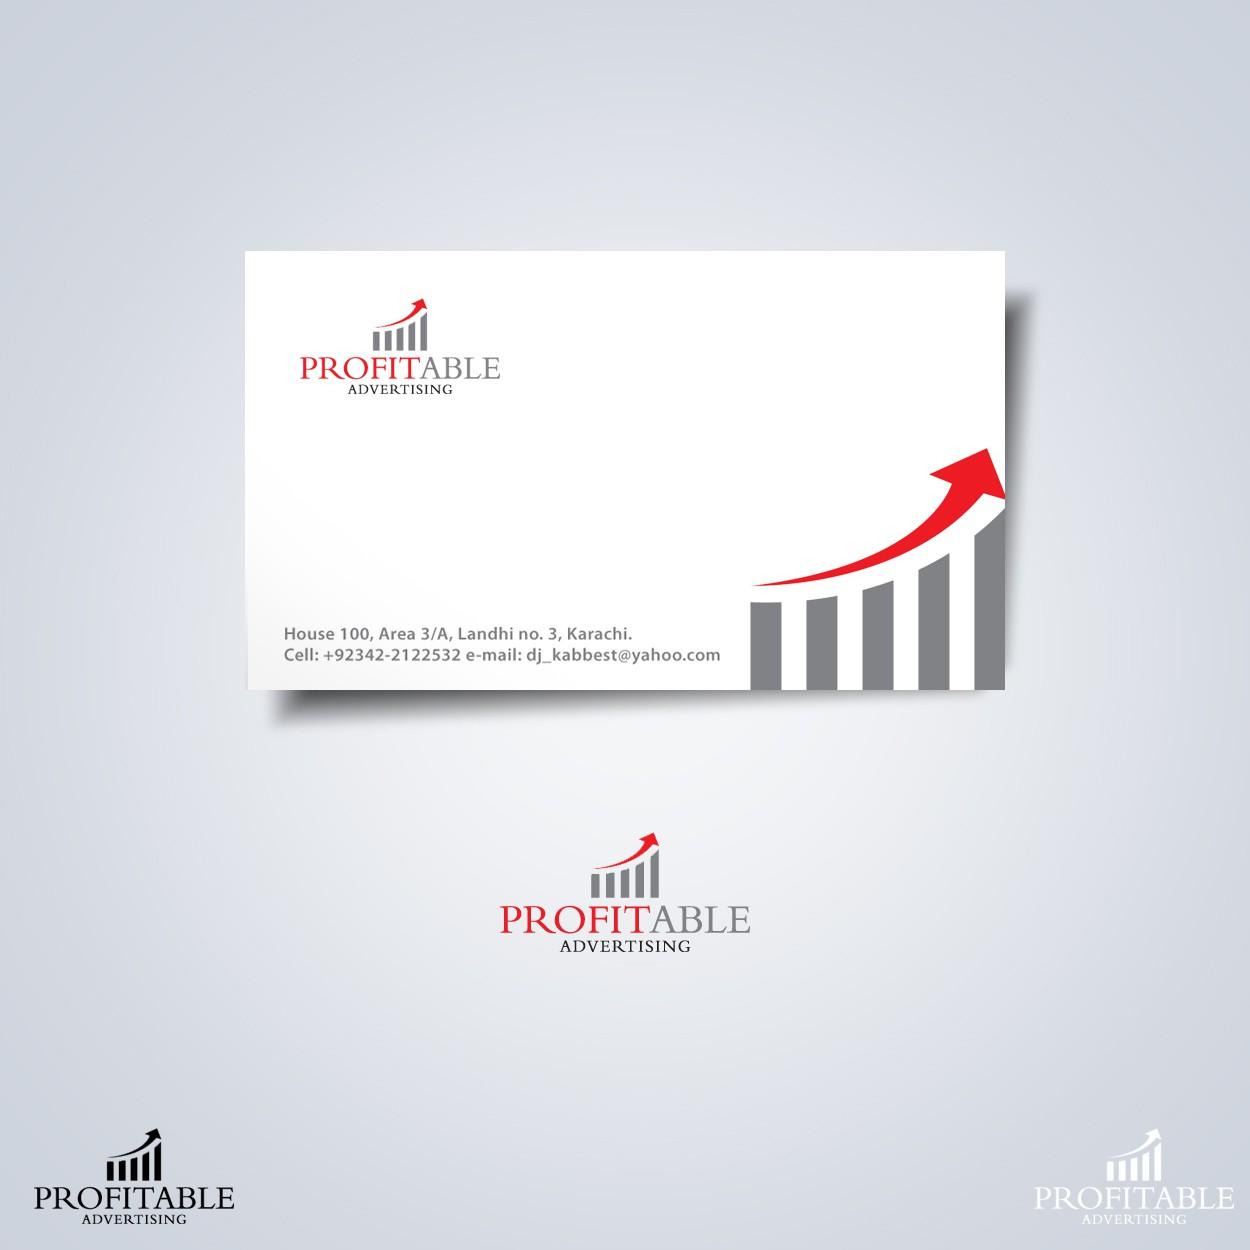 logo for Profitable Advertising